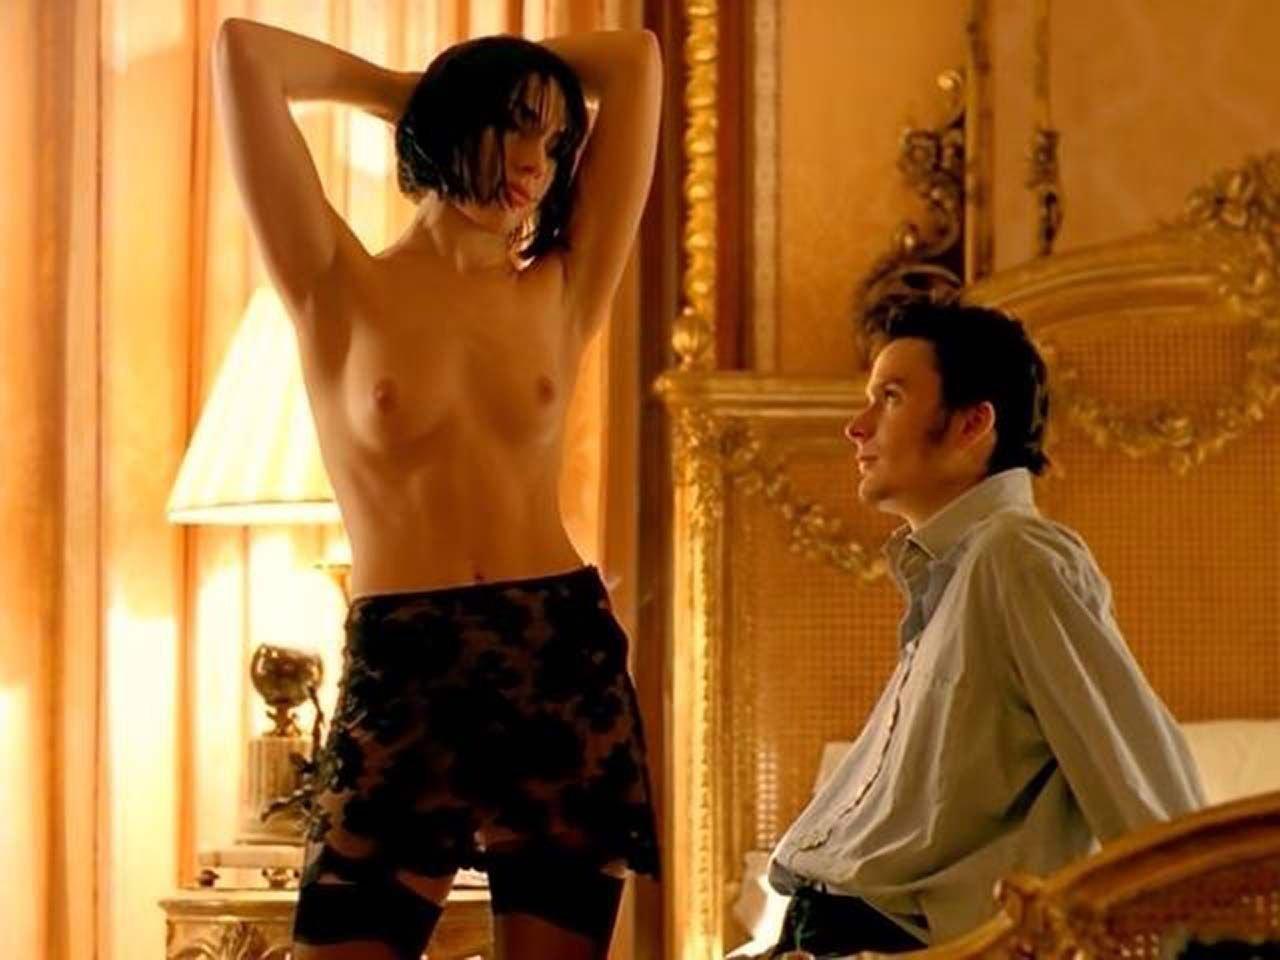 Katherine ryan boobs press nude clip